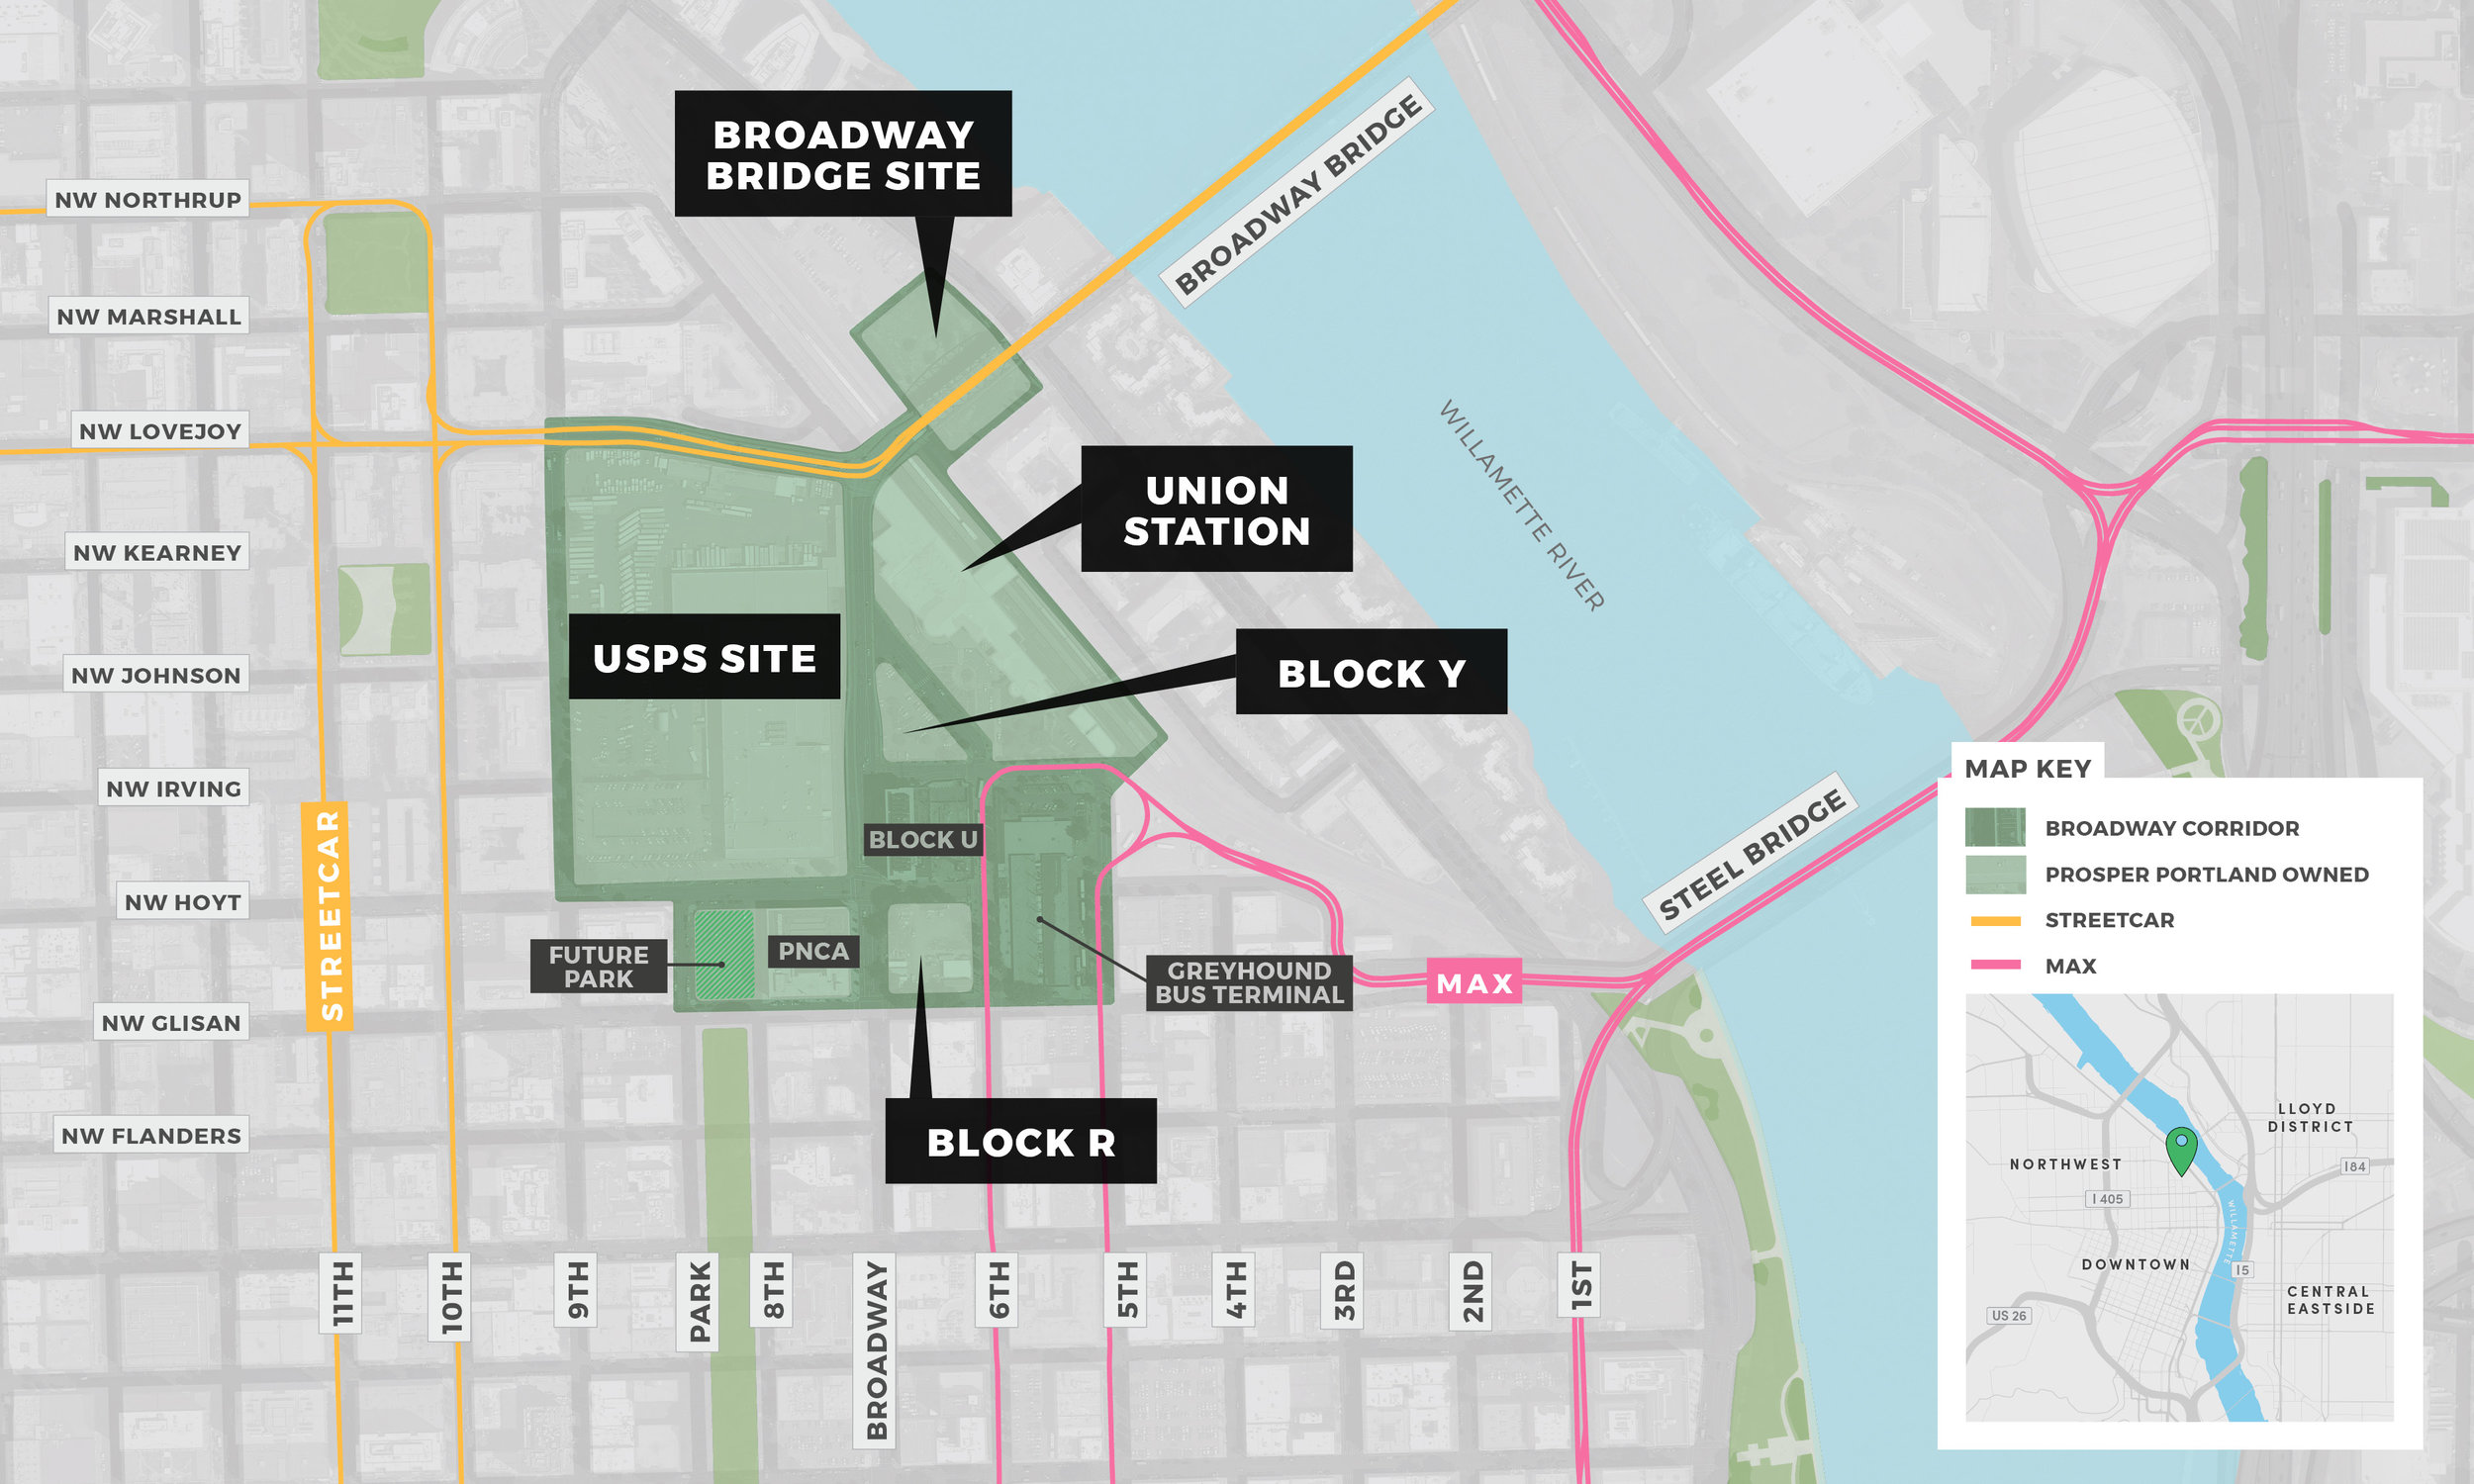 Broadway Corridor_Map_Horizontal_Medium.jpg